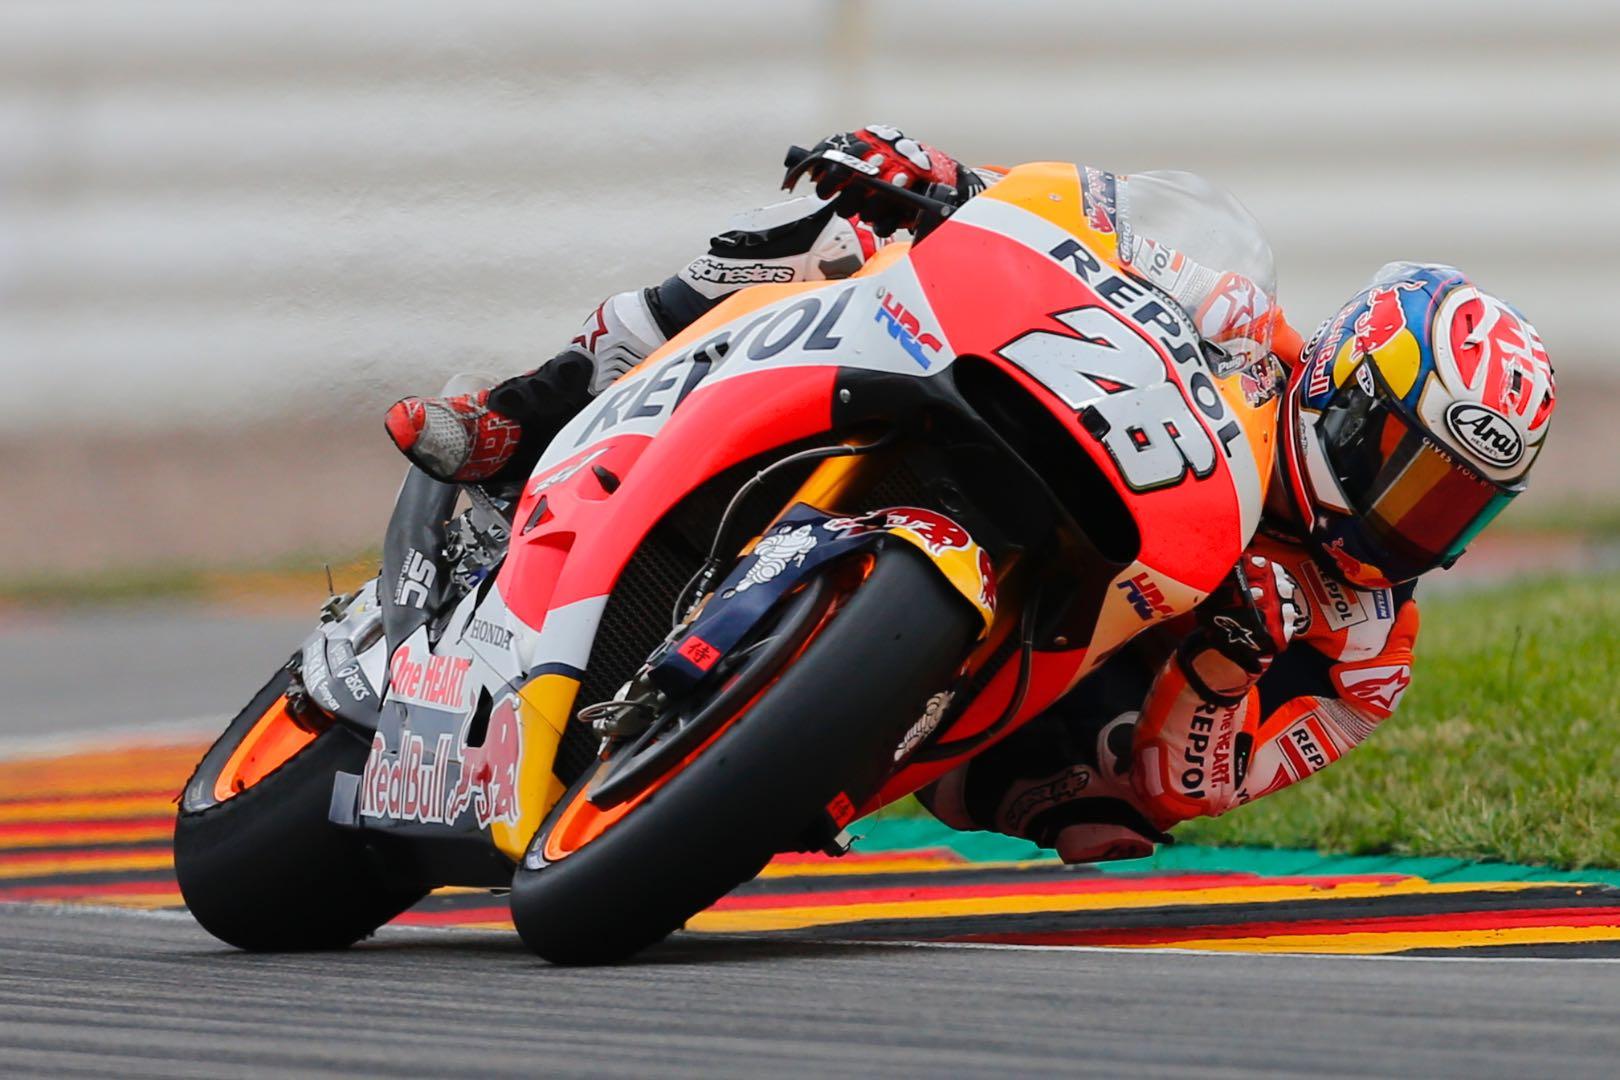 2017 Sachsenring MotoGP Results: Germany Grand Prix Results: Honda's Dani Pedrosa